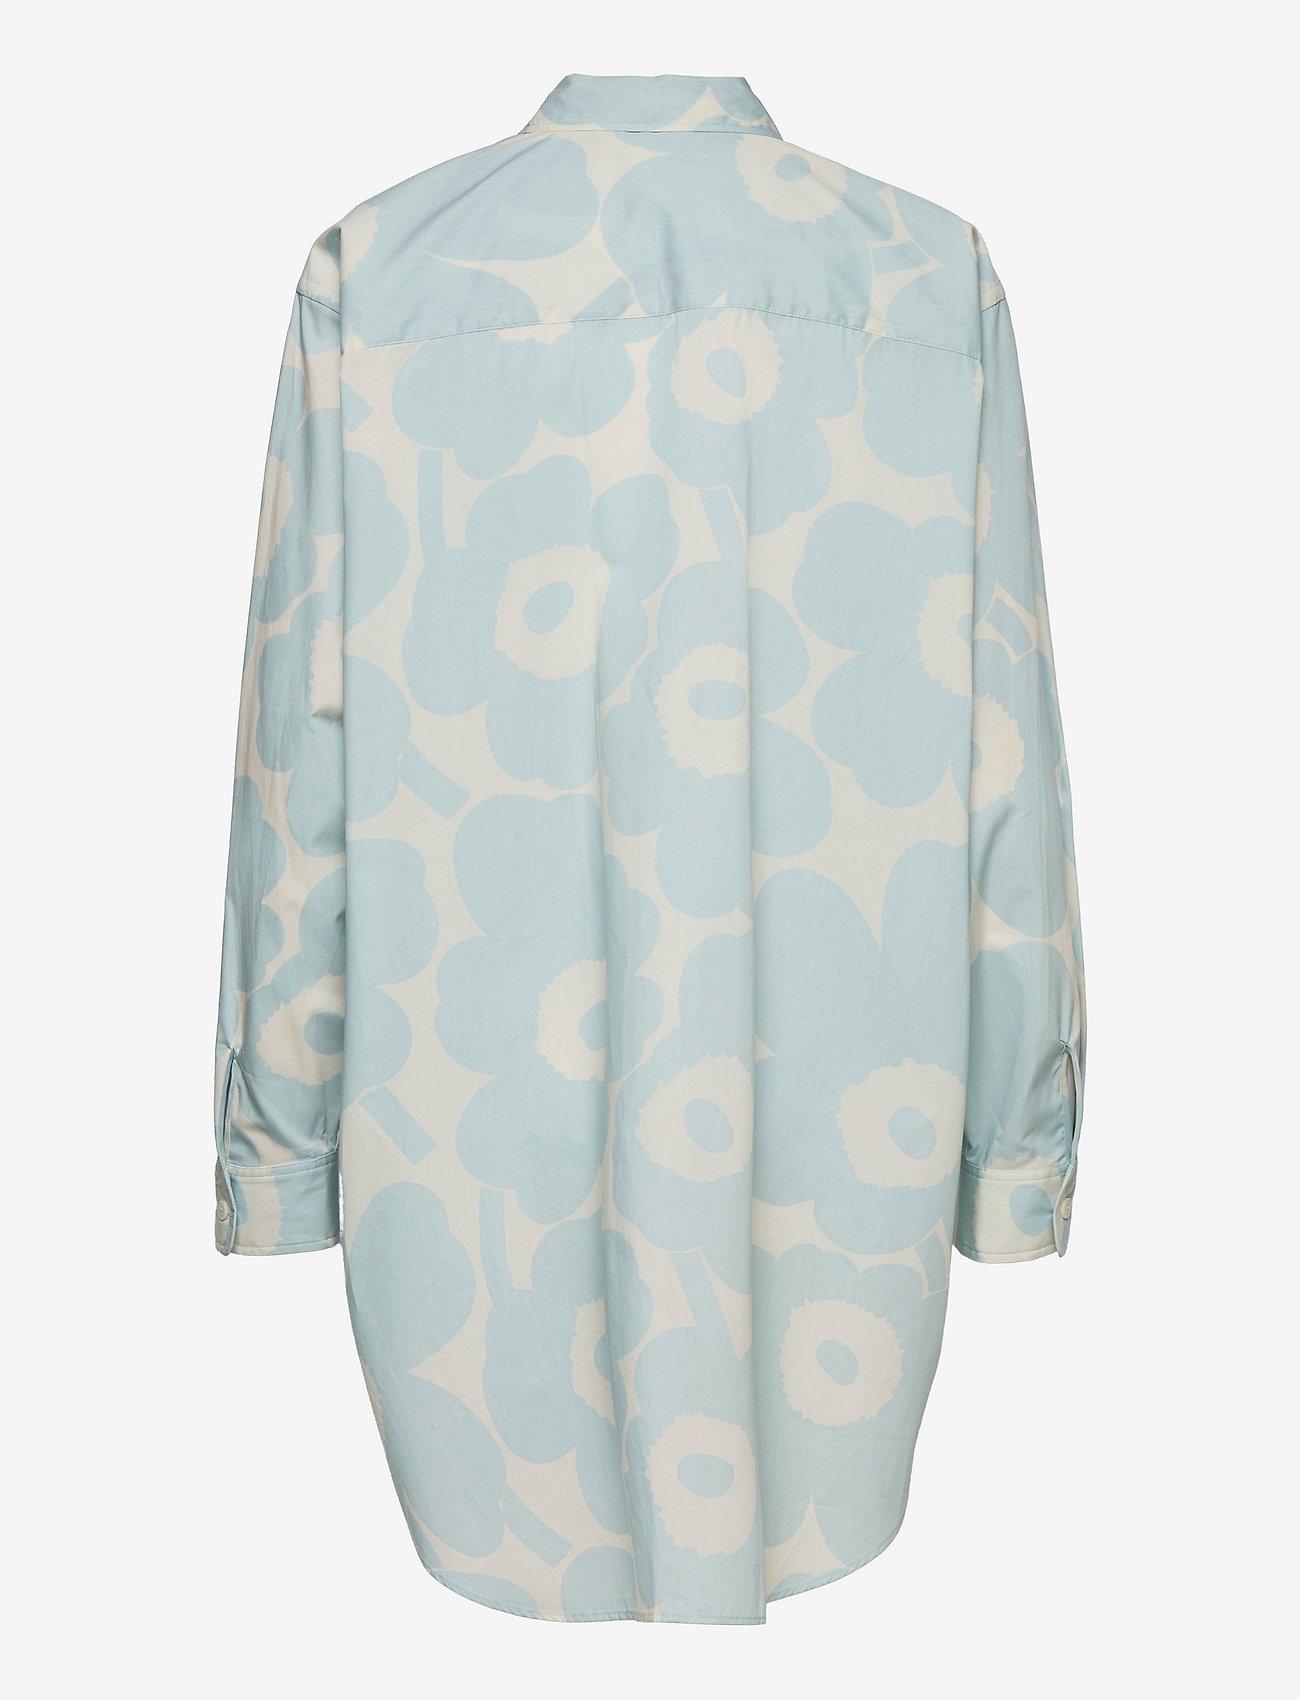 Marimekko - NORKKO PIENI UNIKKO 2 SHIRT - langærmede skjorter - off-white, light blue - 1